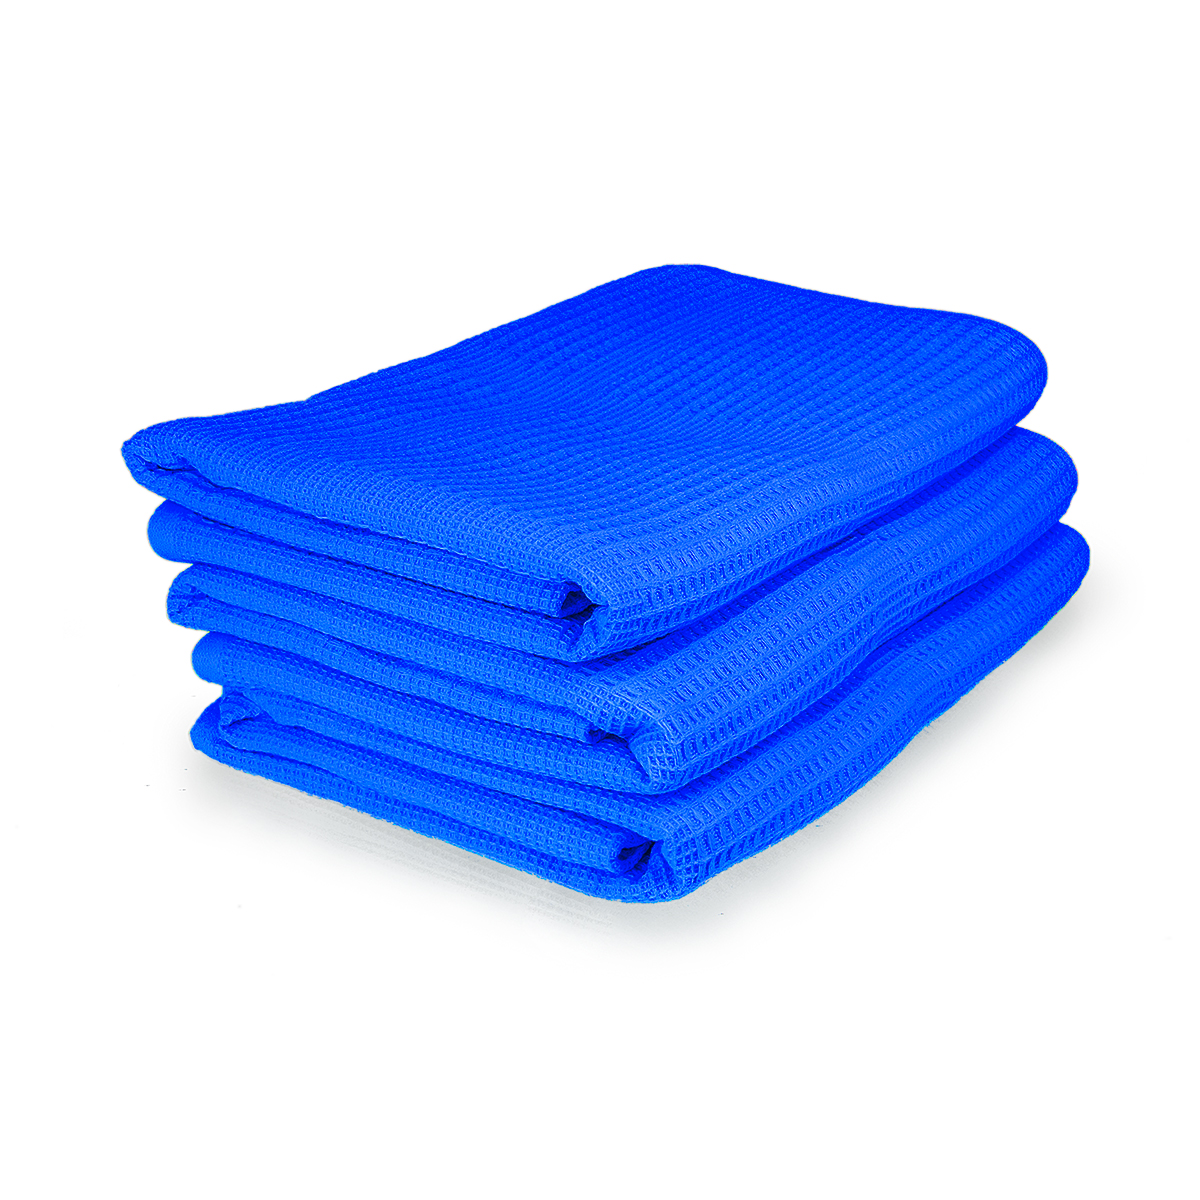 Полотенца Комфорт Синий, размер 80х160 смМахровые полотенца<br>Плотность ткани:380 г/кв. м.<br><br>Тип: Полотенце<br>Размер: 80х160<br>Материал: Вафельное полотно